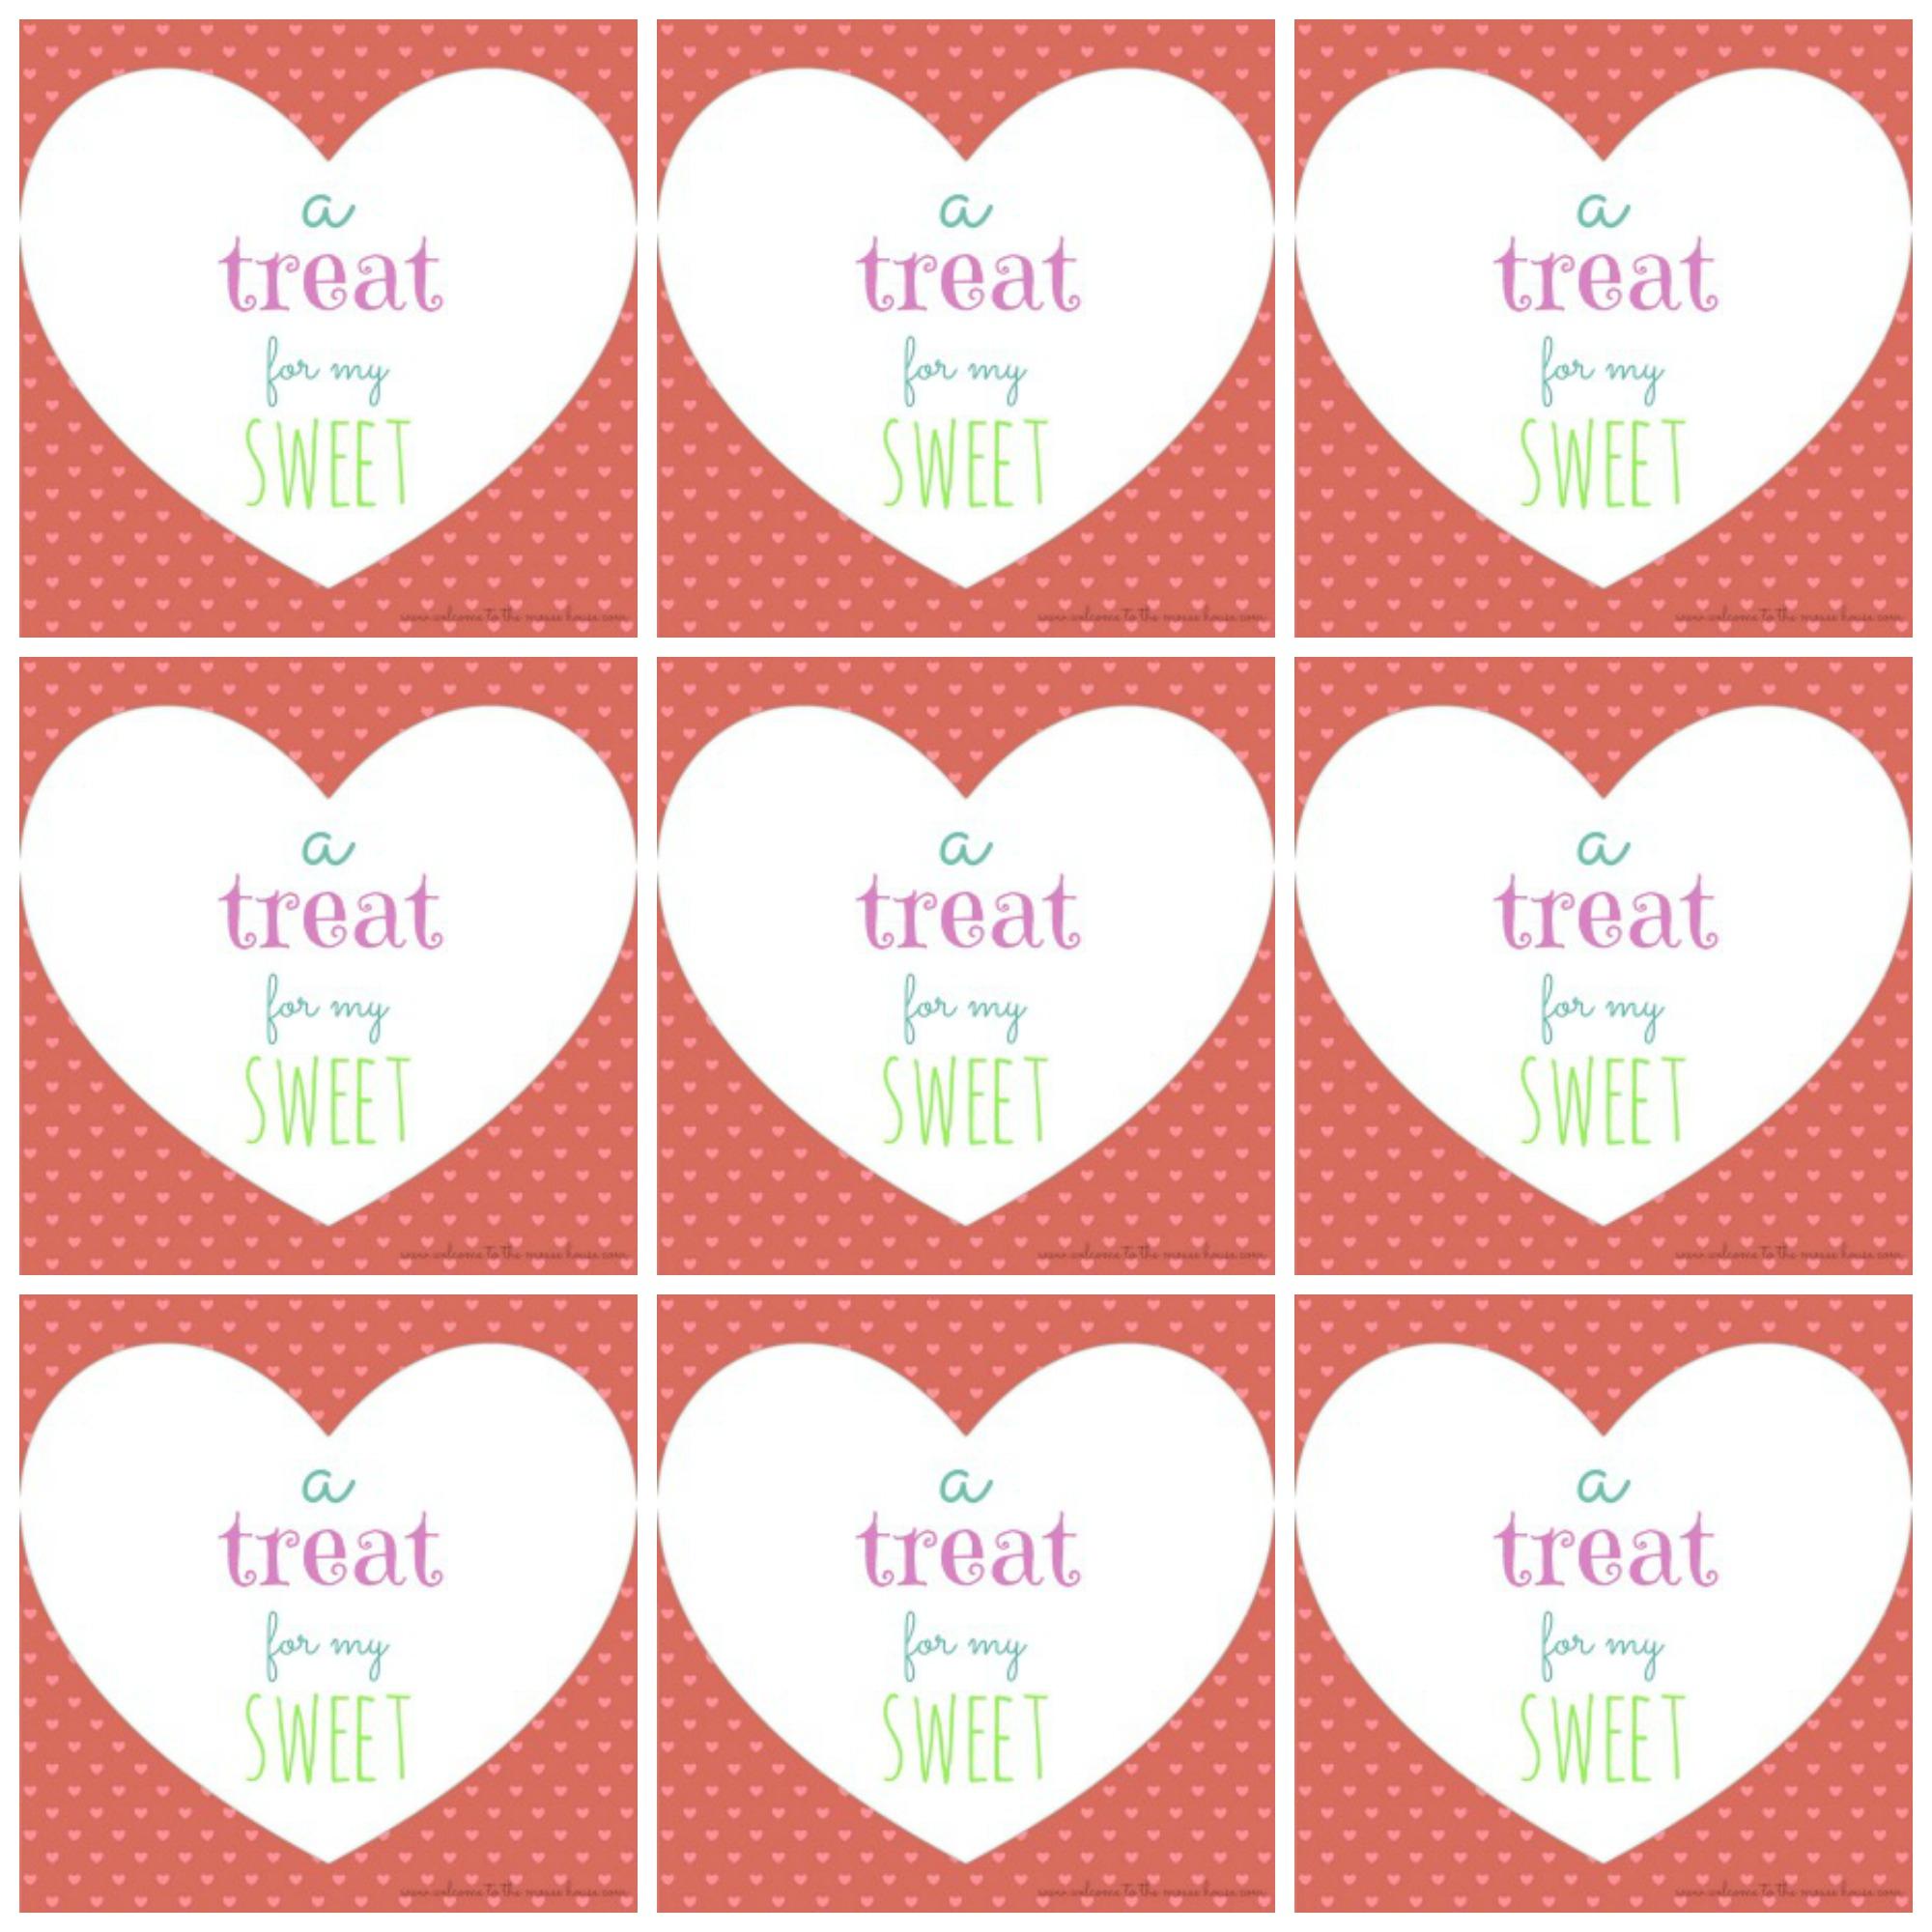 Free Printable Valentine's Day Tags - Free Printable Valentine Tags